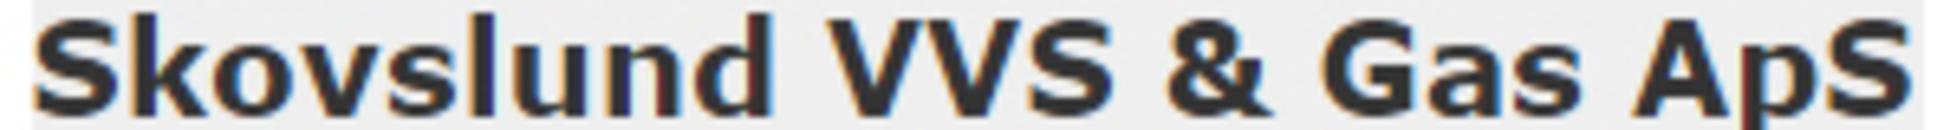 Skovslund - Bernth VVS & Gas ApS logo